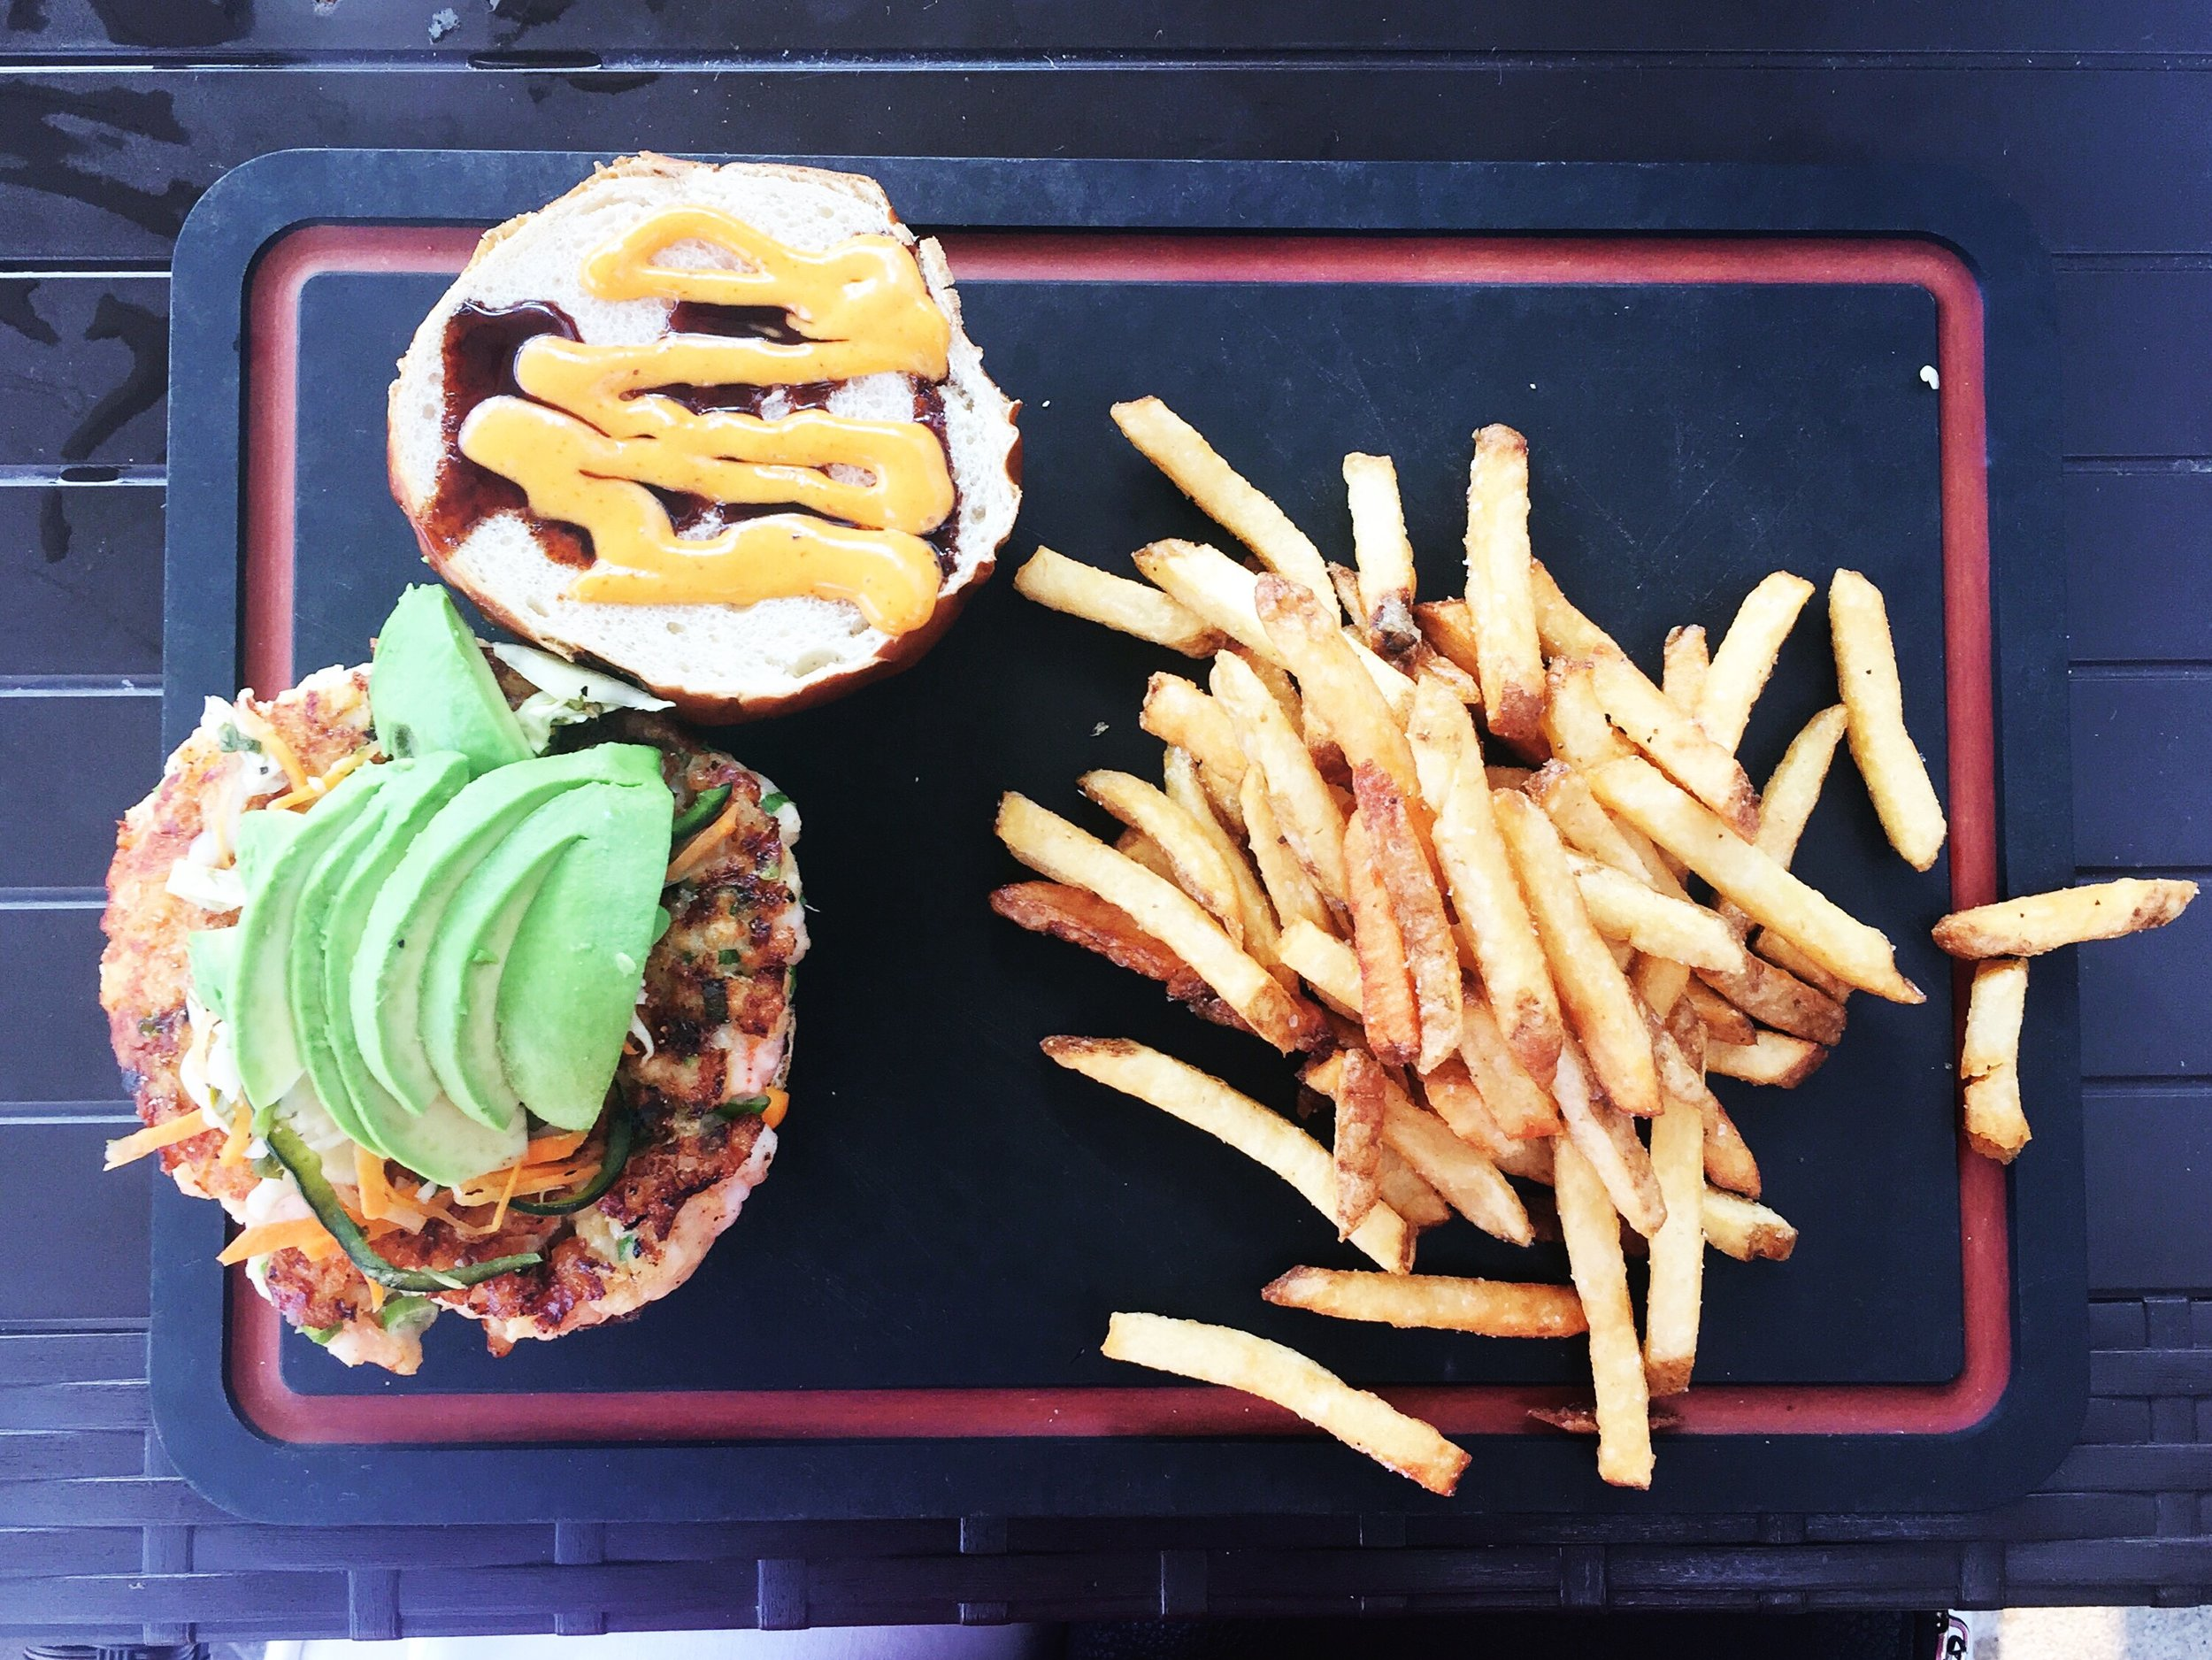 Shrimp burger with pepper slaw, avocado, sriracha aioli, unagi sauce.